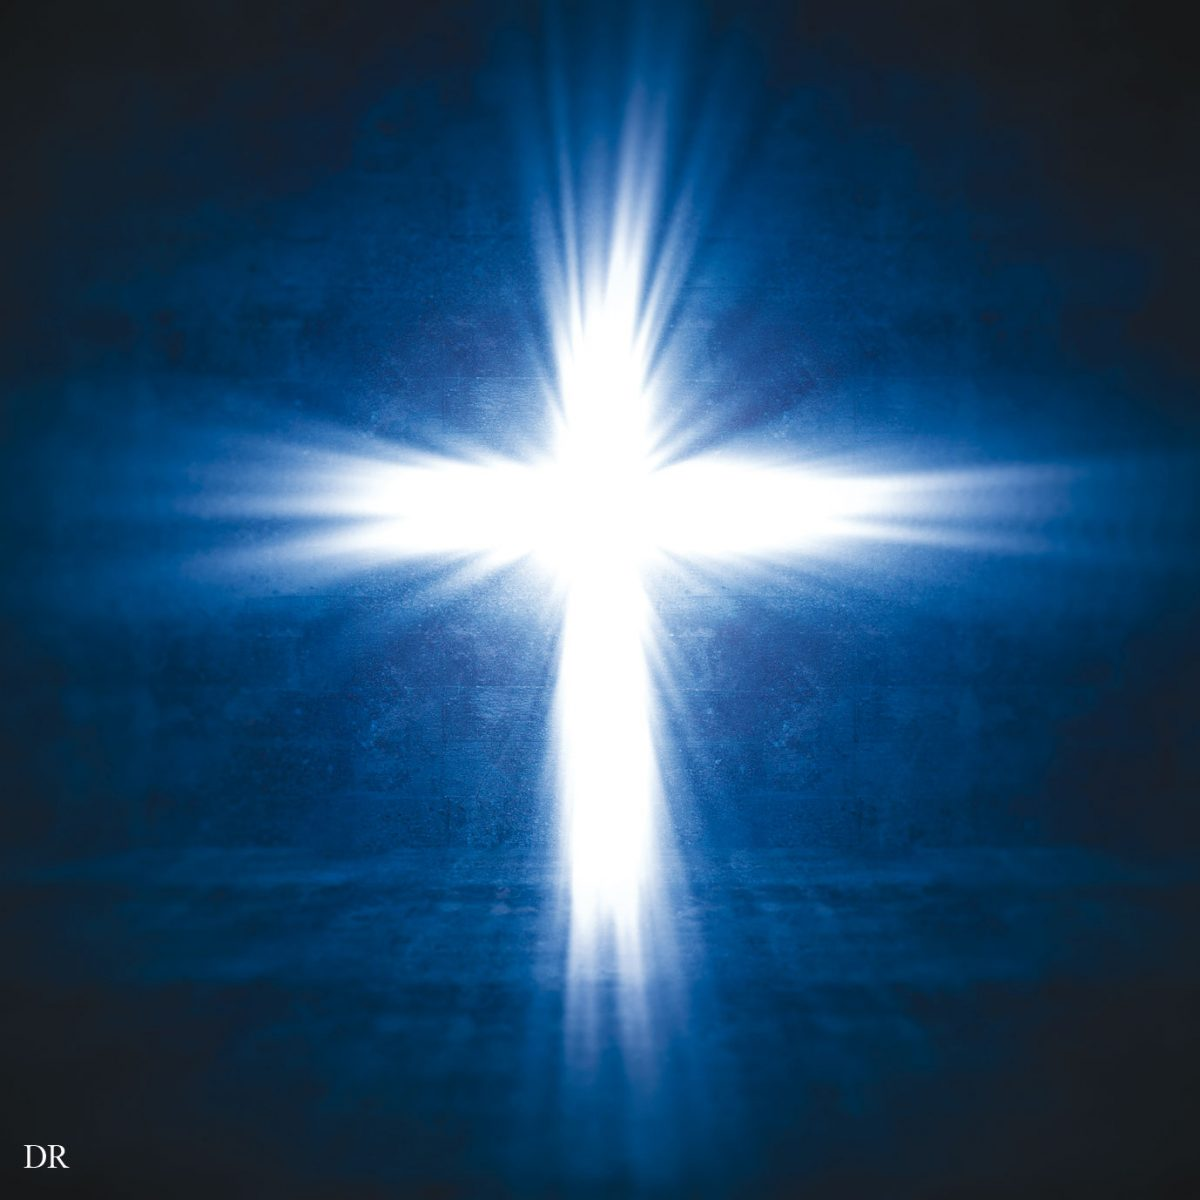 astrologie et religion - Page 2 Croix_Lumineuse